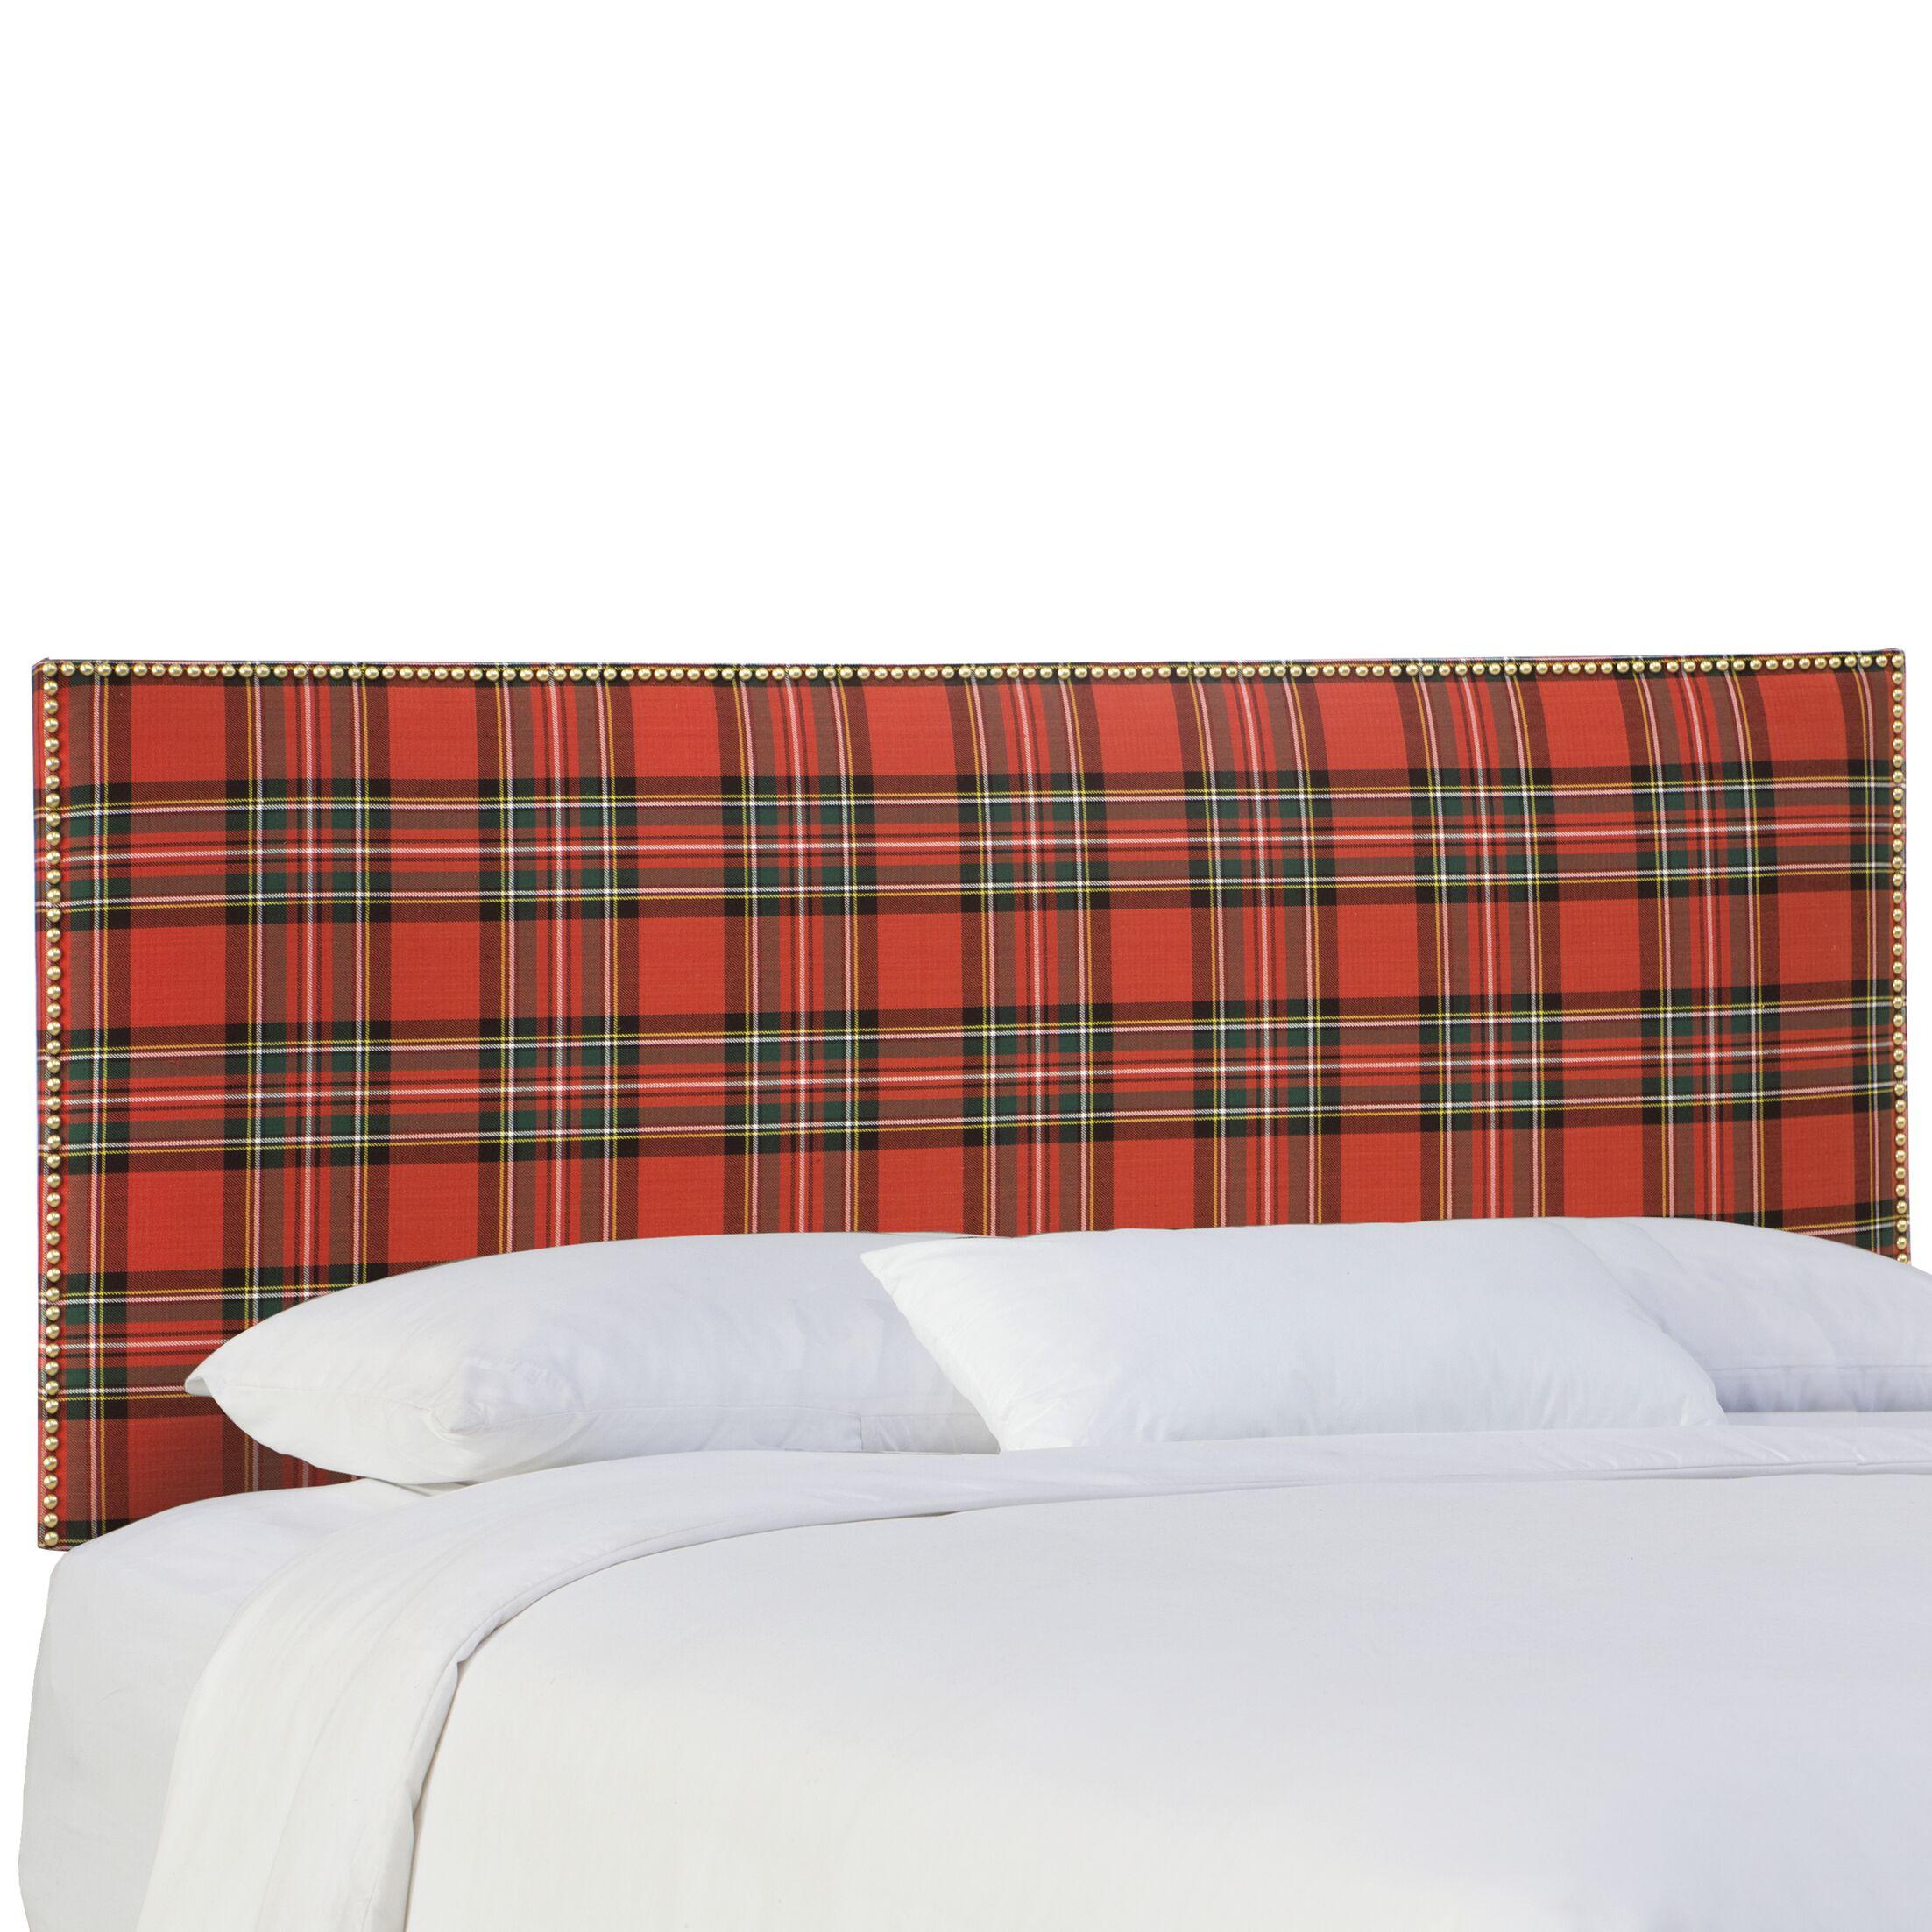 Simonds Upholstered Panel Headboard Size: Queen